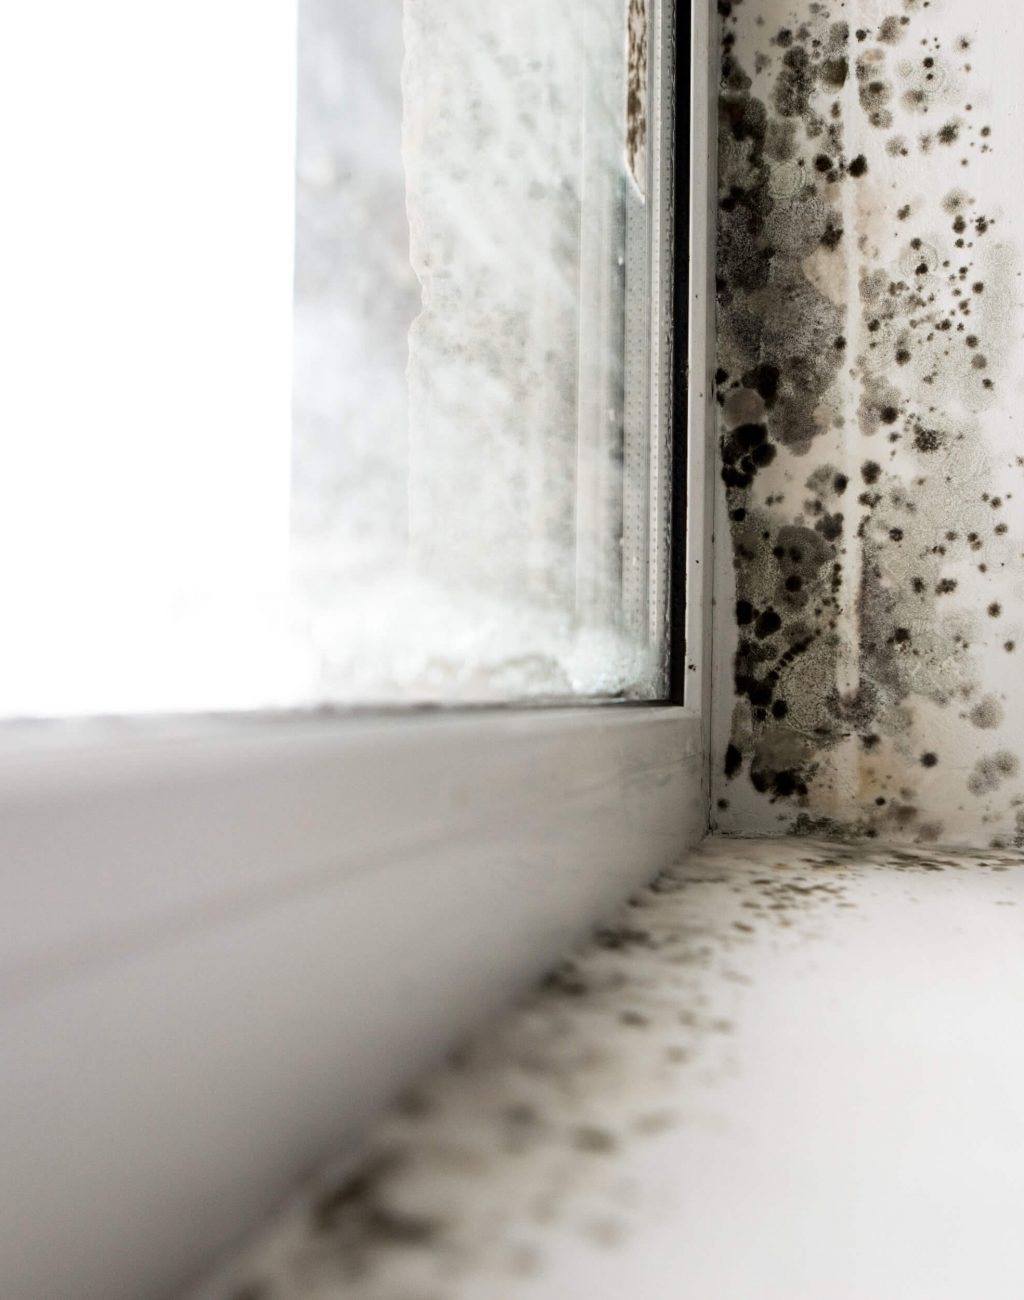 condensation pic 9